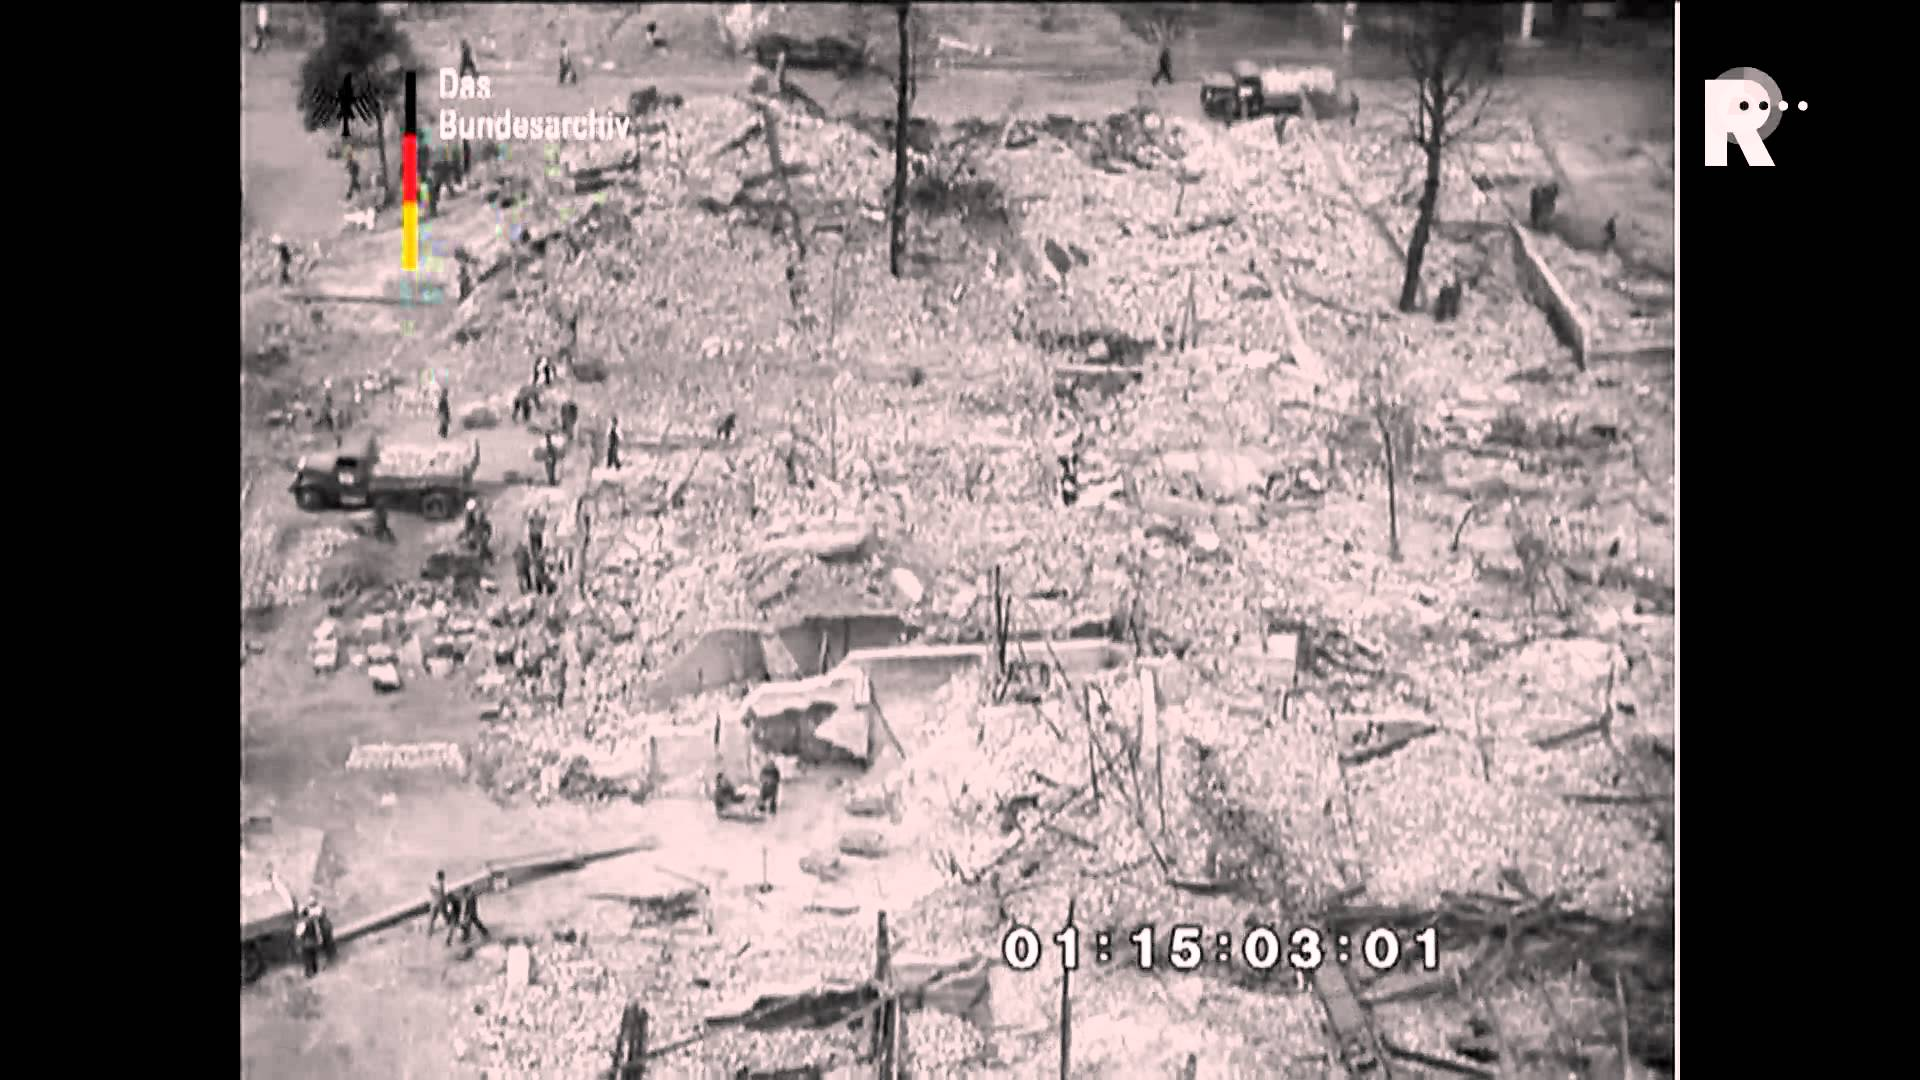 Onbekende beelden verwoesting Rotterdam en Middelburg opgedoken